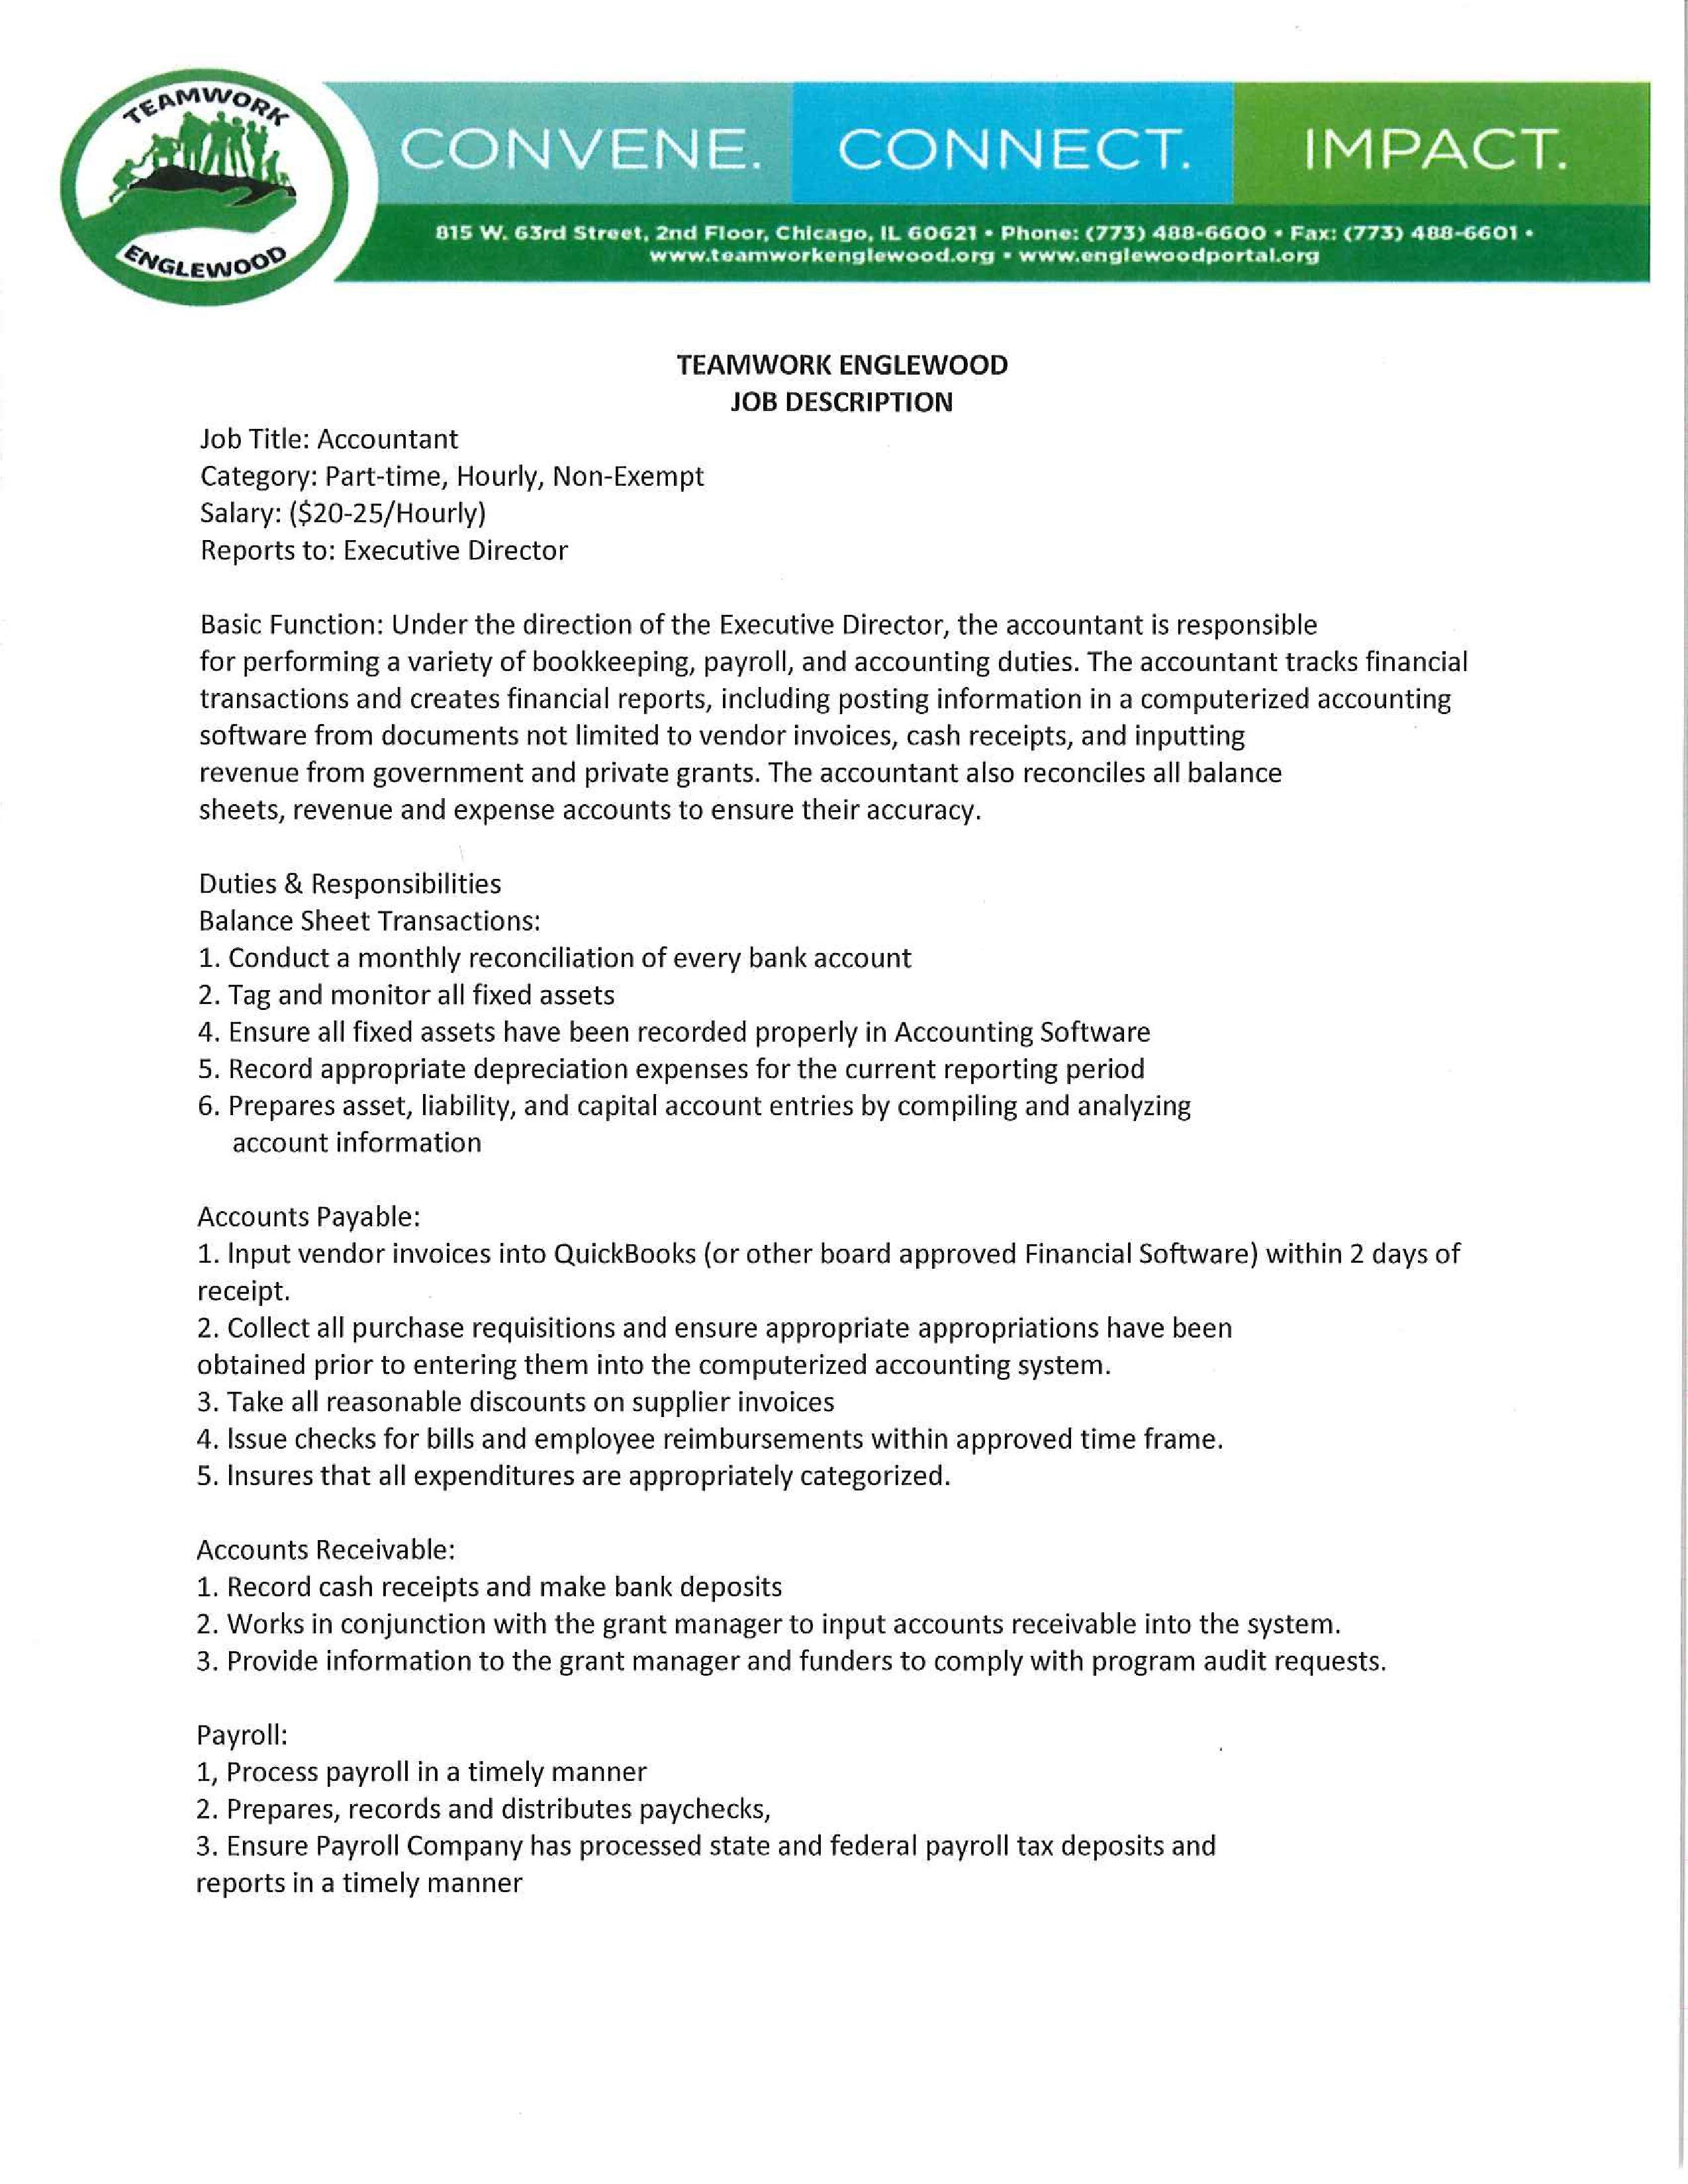 Teamwork Englewood is seeking an Accountant — Englewood Portal